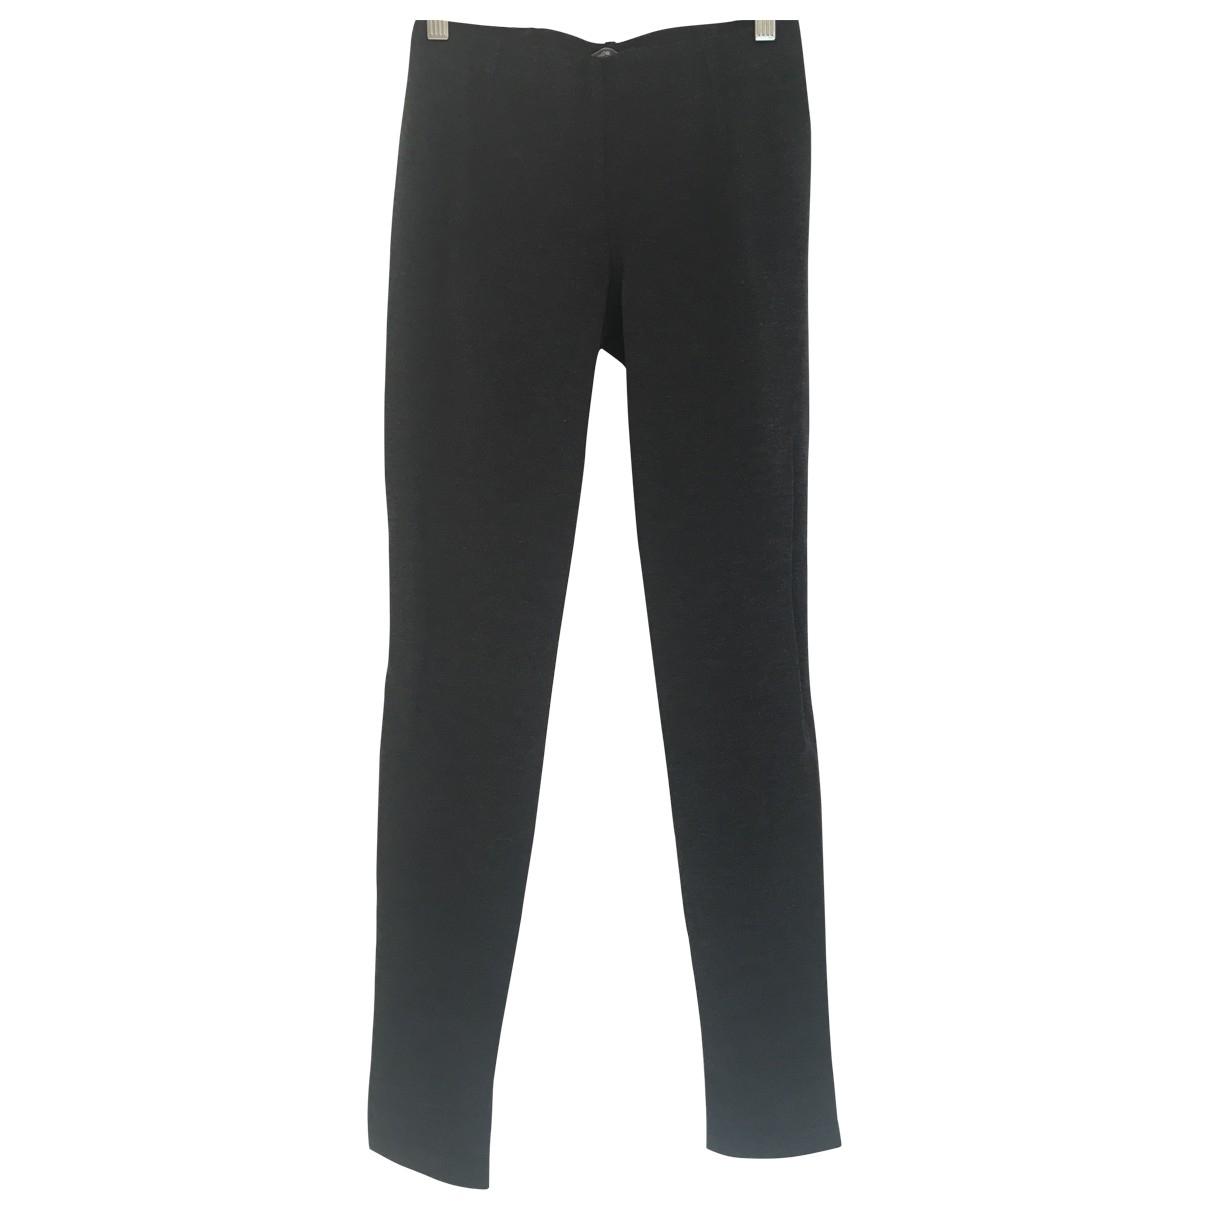 Vince \N Grey Trousers for Women XS International